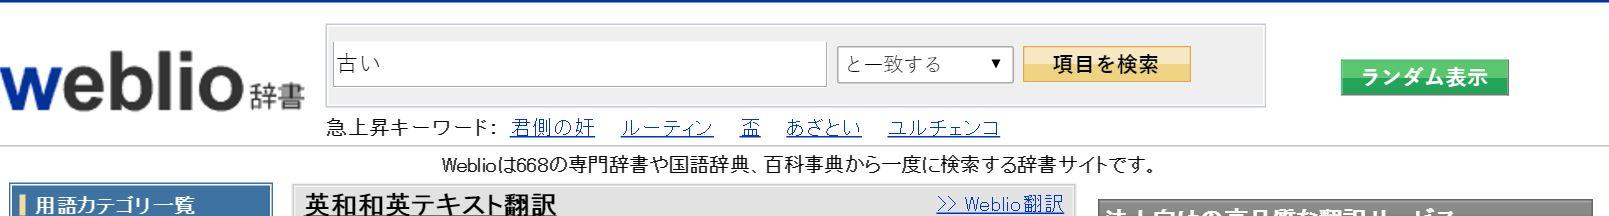 Randomly Enjoying New Japanese 1